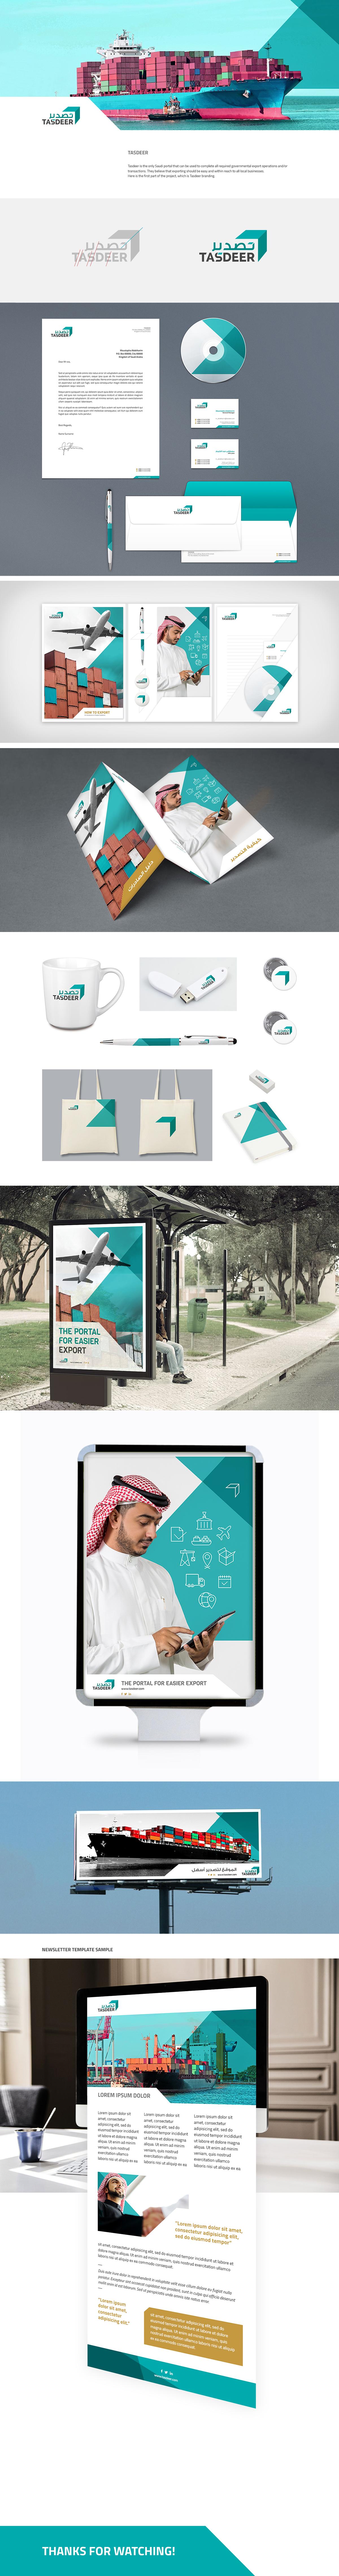 branding  logo identity posters Communication Tools marketing